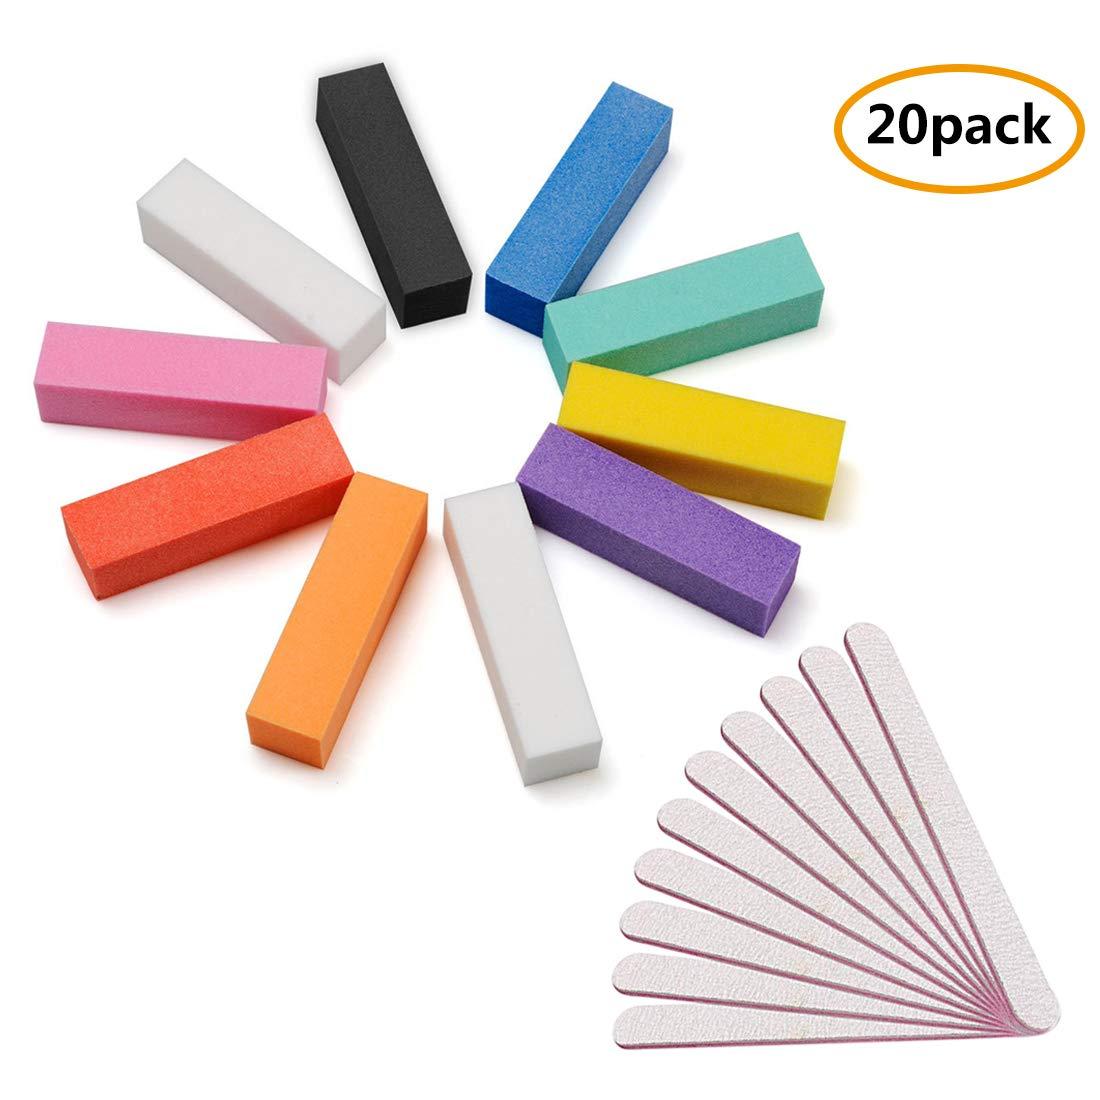 Nail Files Buffers, 20Pcs Professional Nail Buffer Blocks File Polisher Assorted Colors, Nail Files 10pcs + Buffers 10pcs, 100/180 Grit